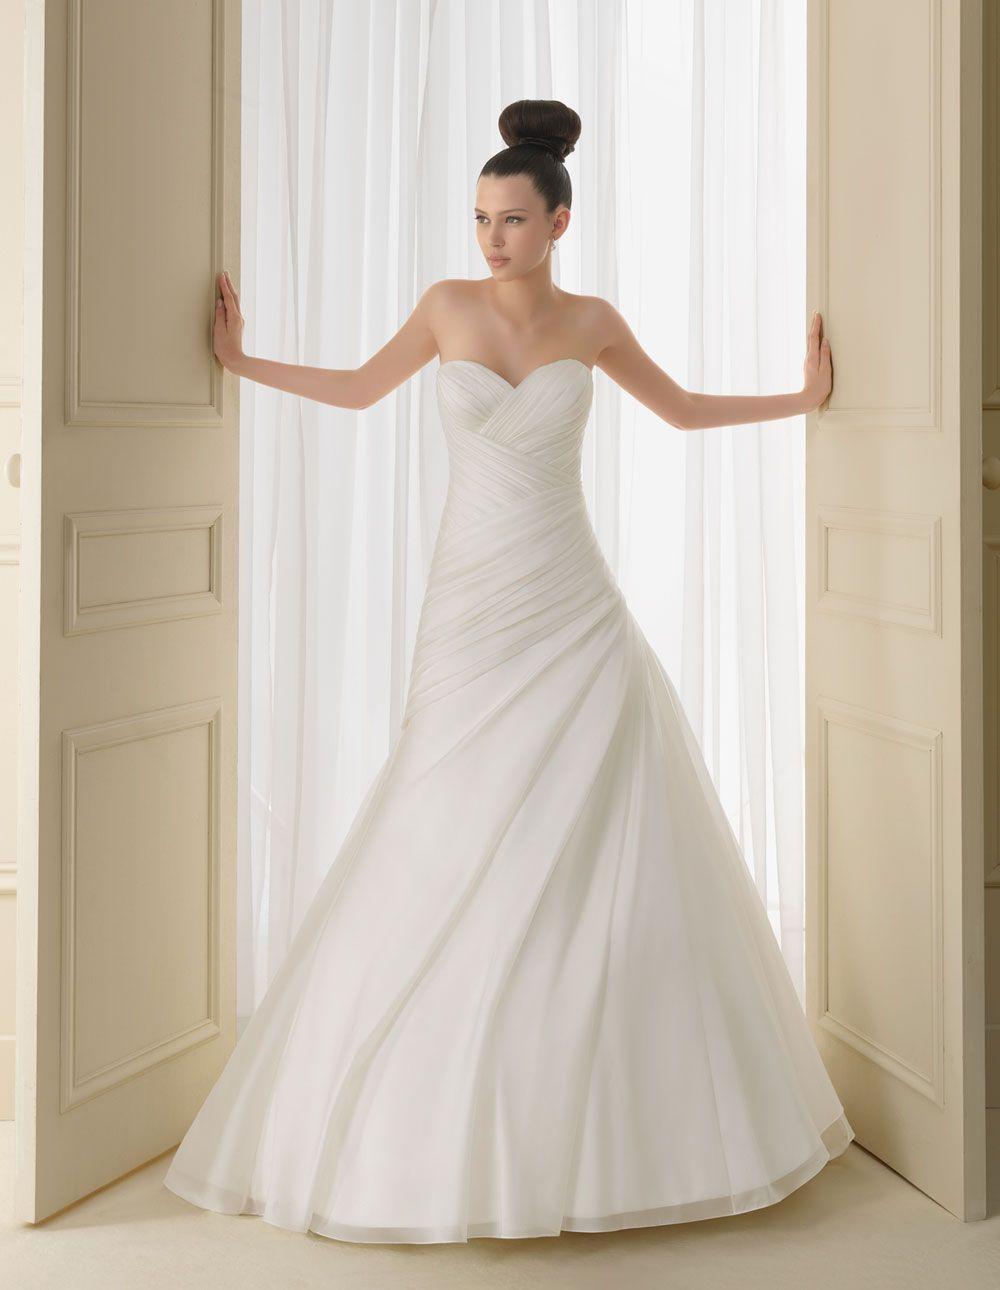 Silhouette wedding dresses simple bridal  A classic silhouette   Isla  LUNA NOVIAS YOUR DRESS without